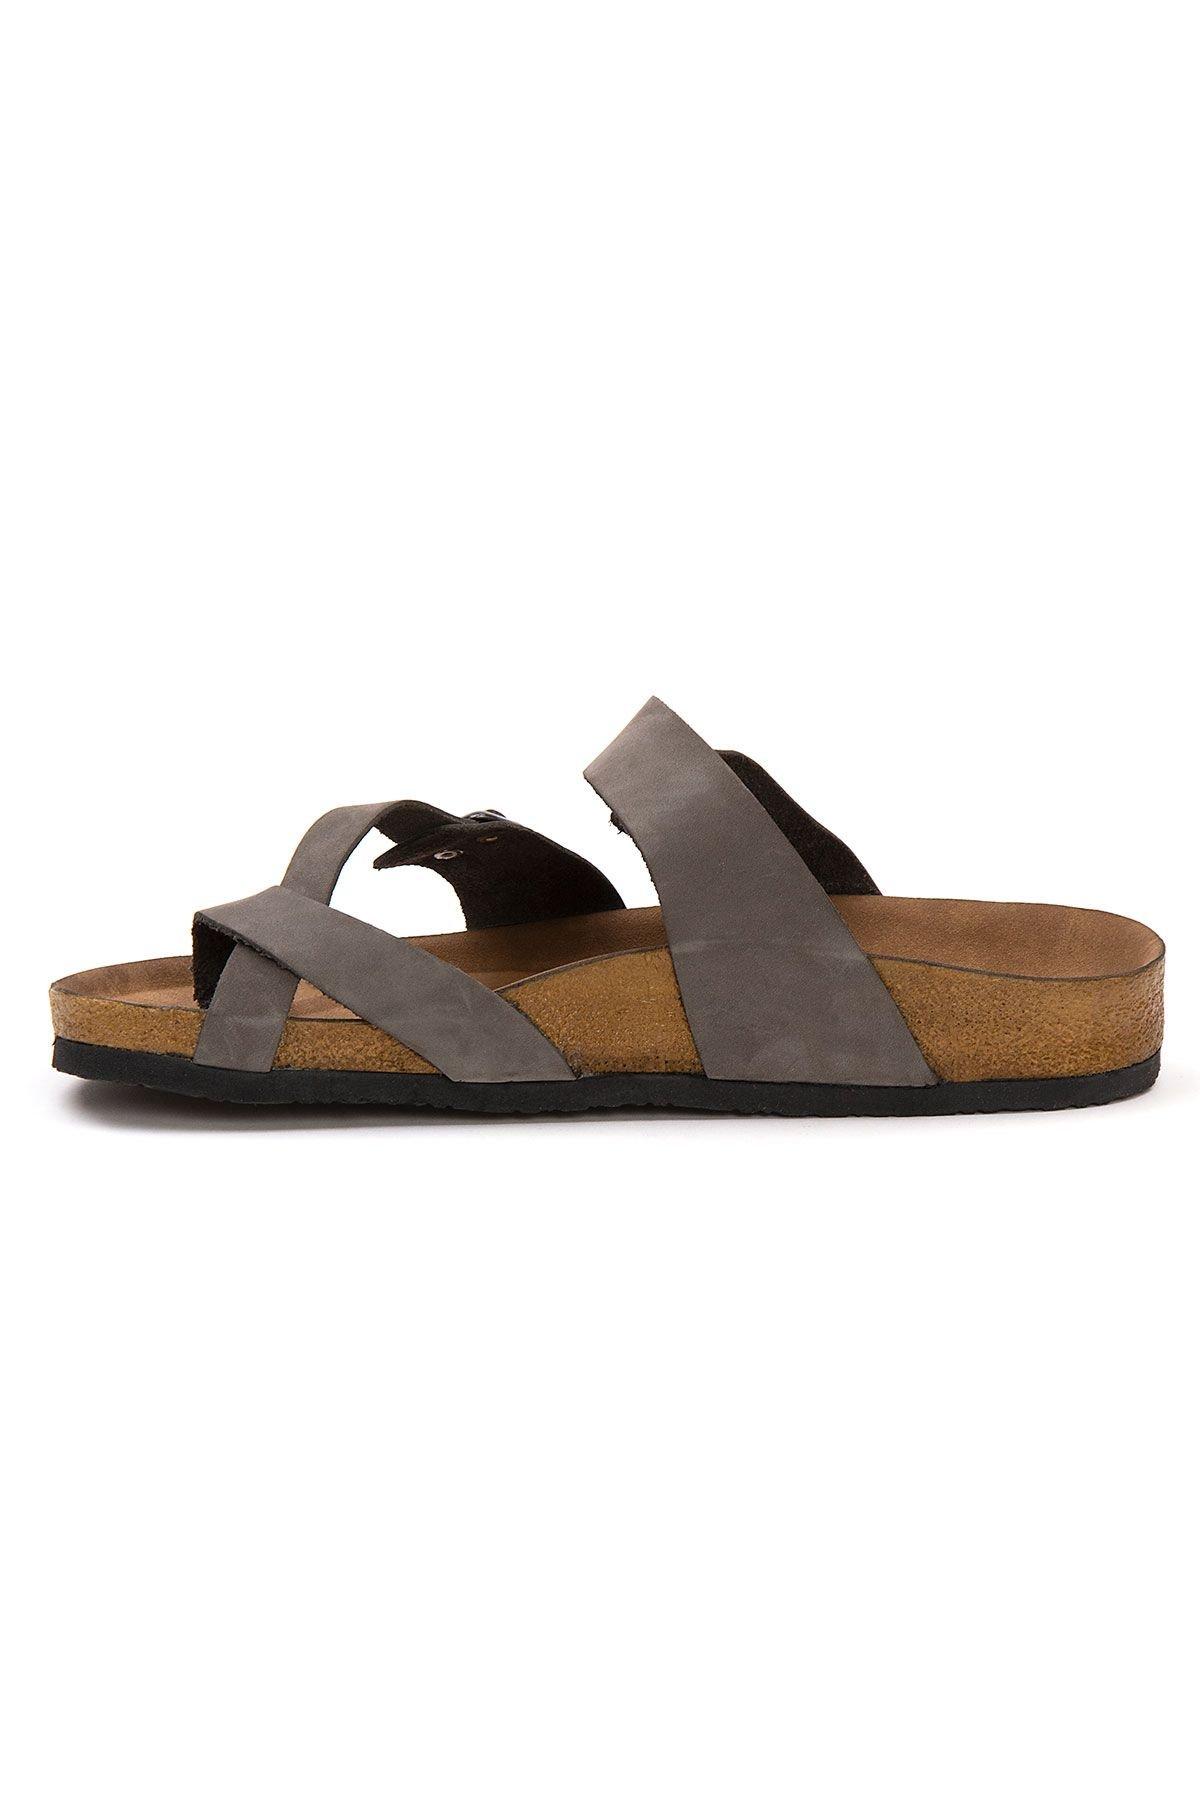 Pegia Genuine Leather Men's Slippers 215022 Gray